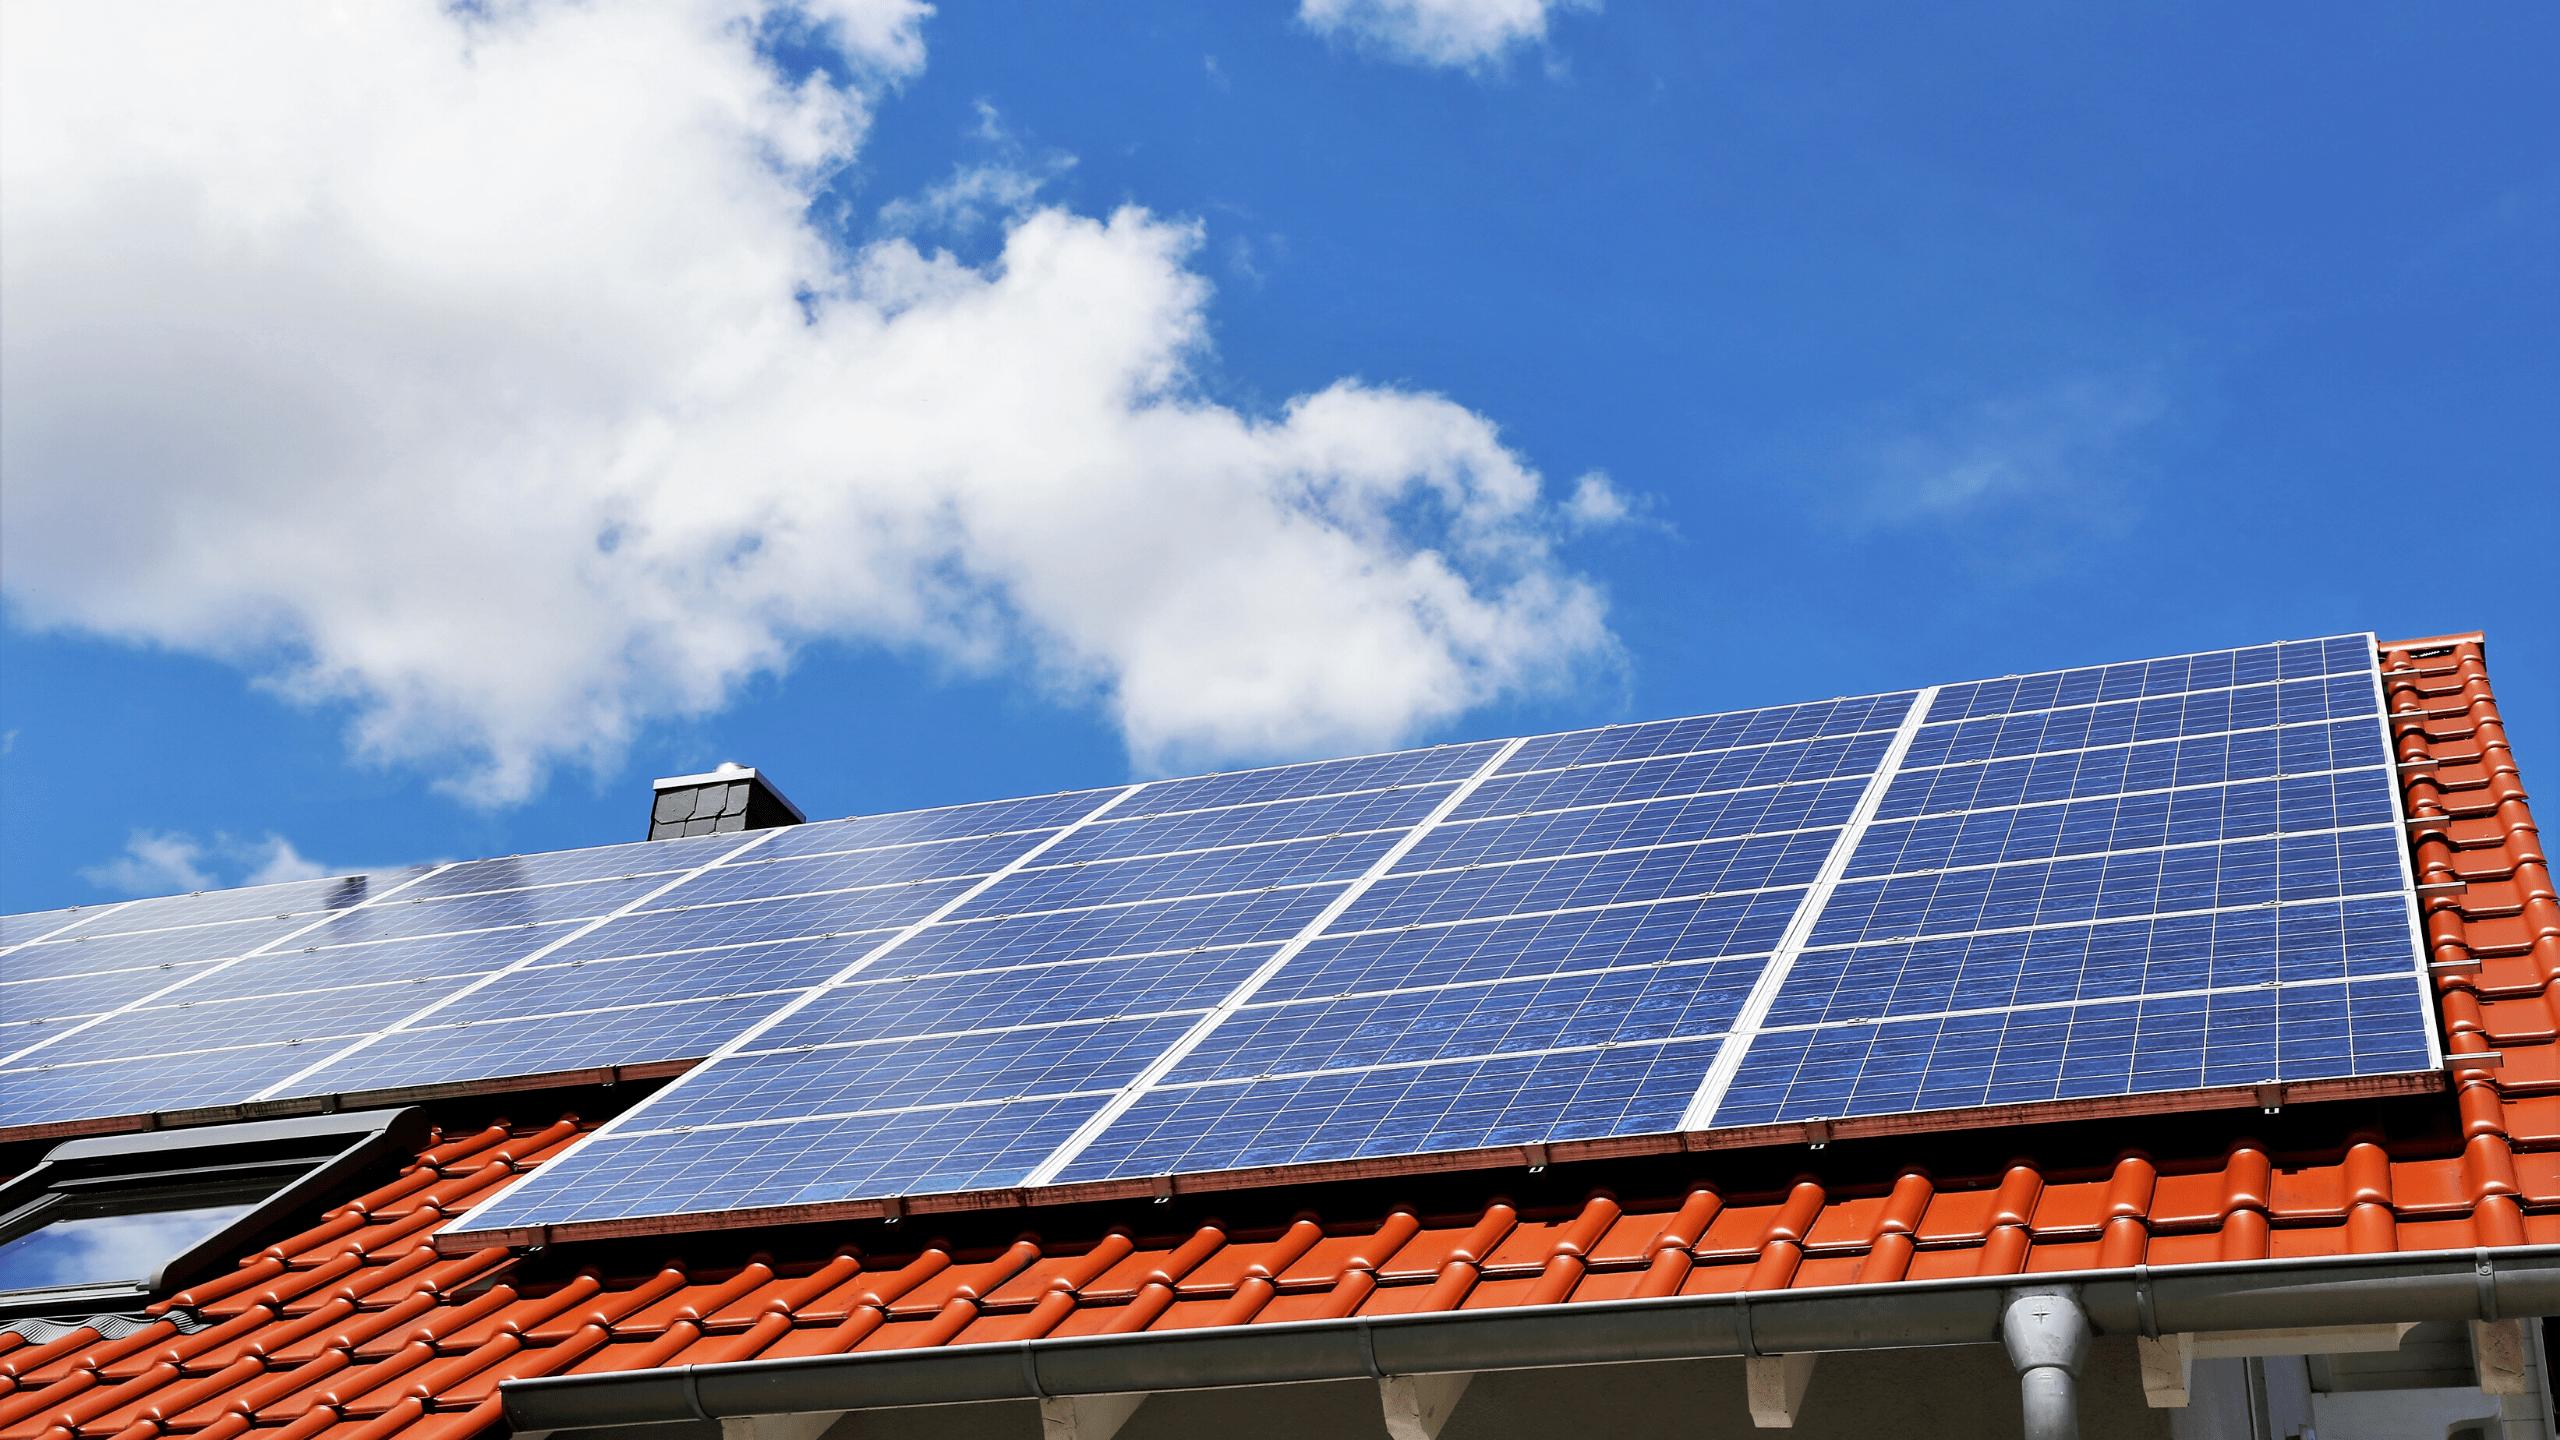 SOLAR-PANELS-NORTHERN-IRELAND-SOLAR PANEL-PROVIDER-DISTRIBUTOR-NORTHERN-IRELAND-BELFAST-SOLAR-PANEL